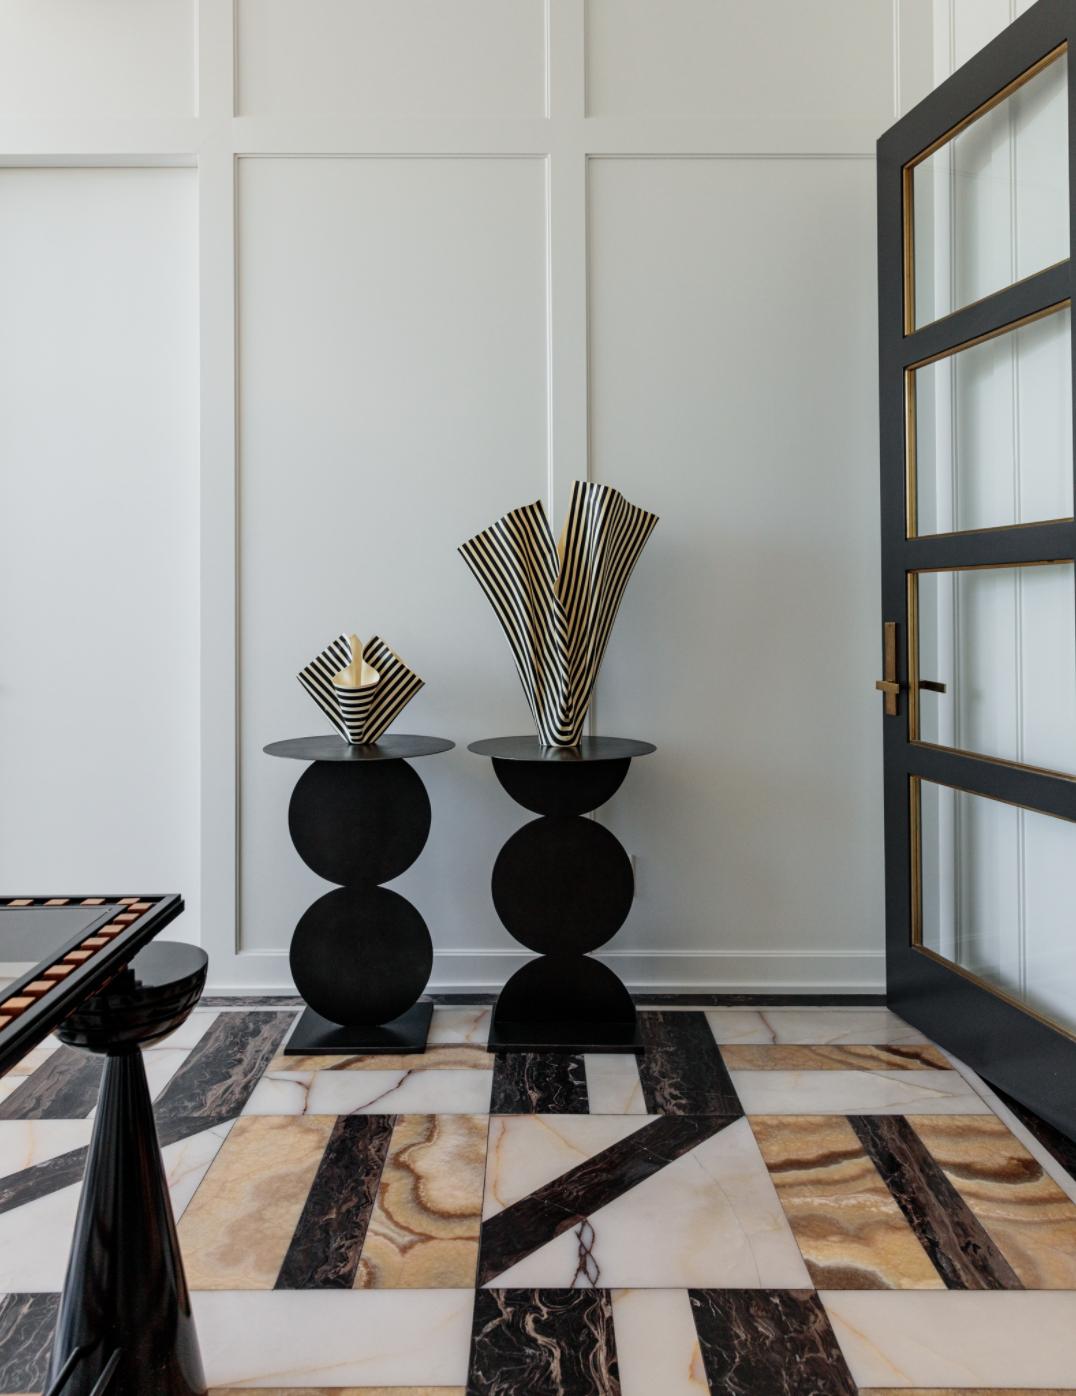 Kelly Wearstler Studio Interior Design Luxury Interior Design Kelly Wearstler Interiors